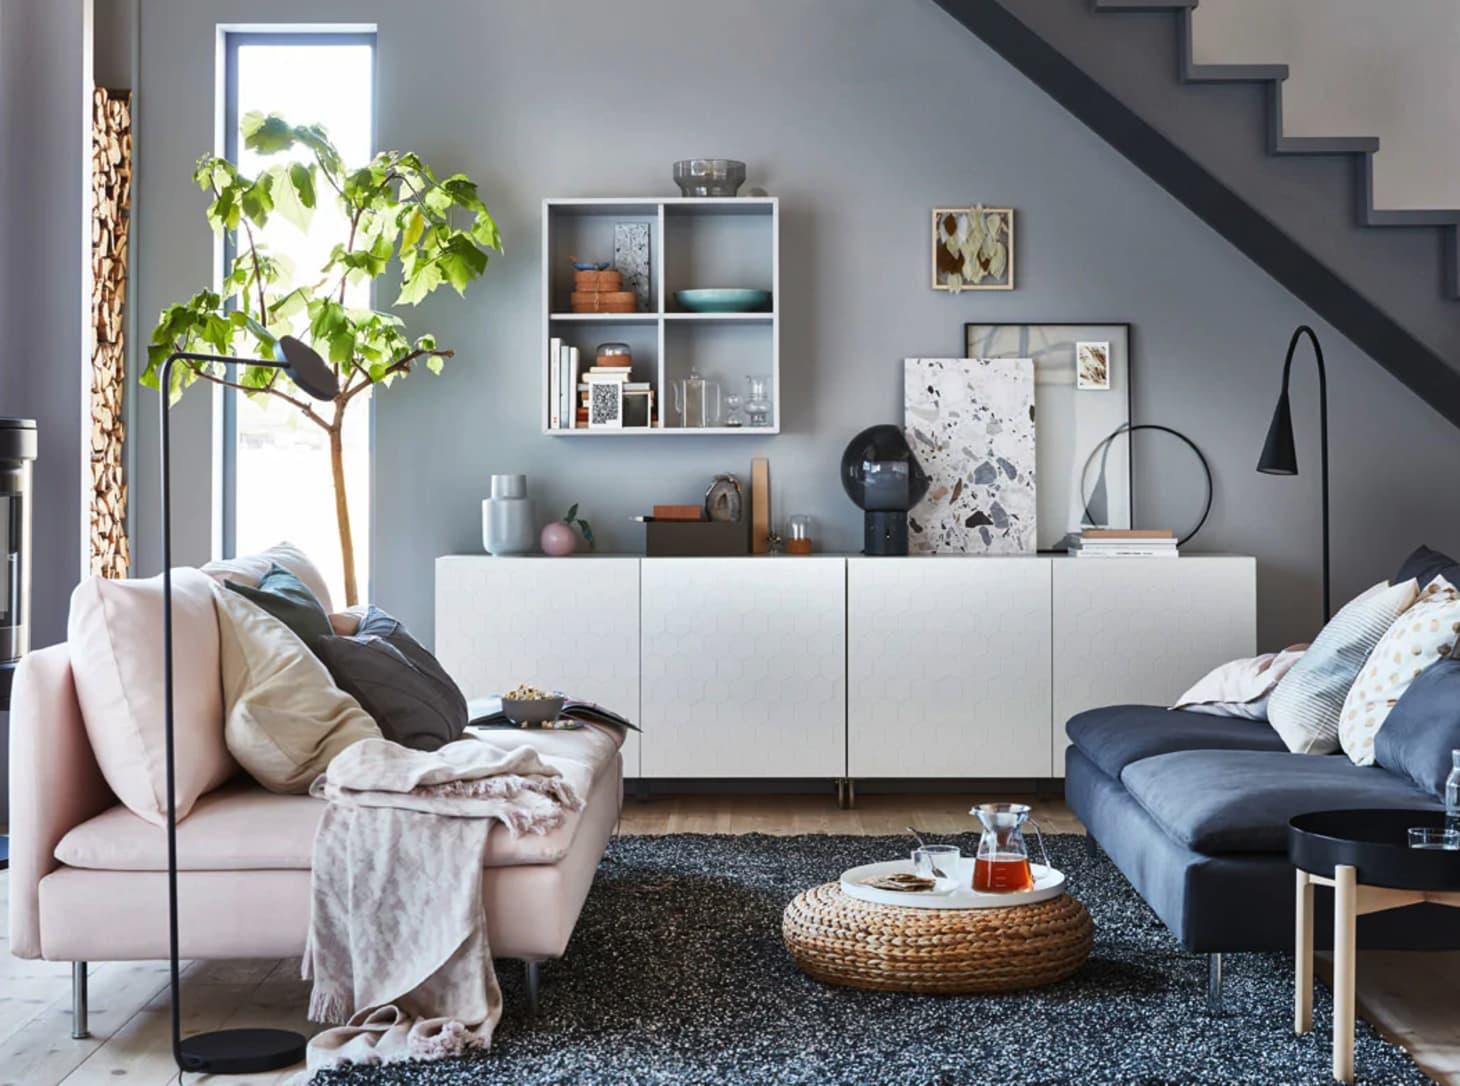 Cozy IKEA Living Room Design Ideas - IKEA Living Rooms ...